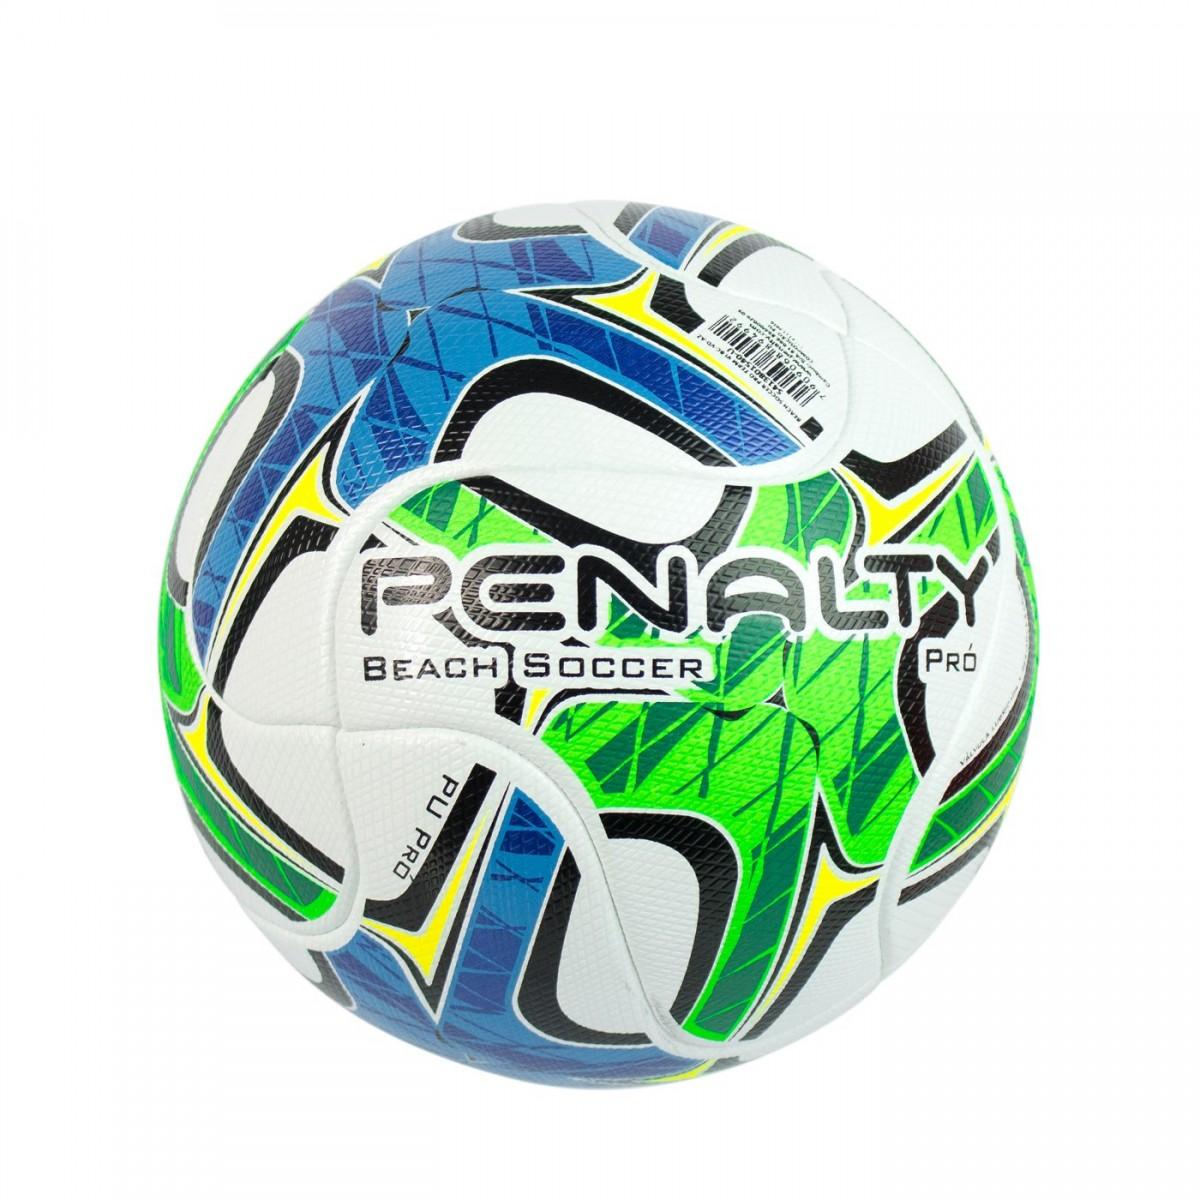 43873d15b Bizz Store - Bola Beach Soccer Penalty Pró Term Profissional